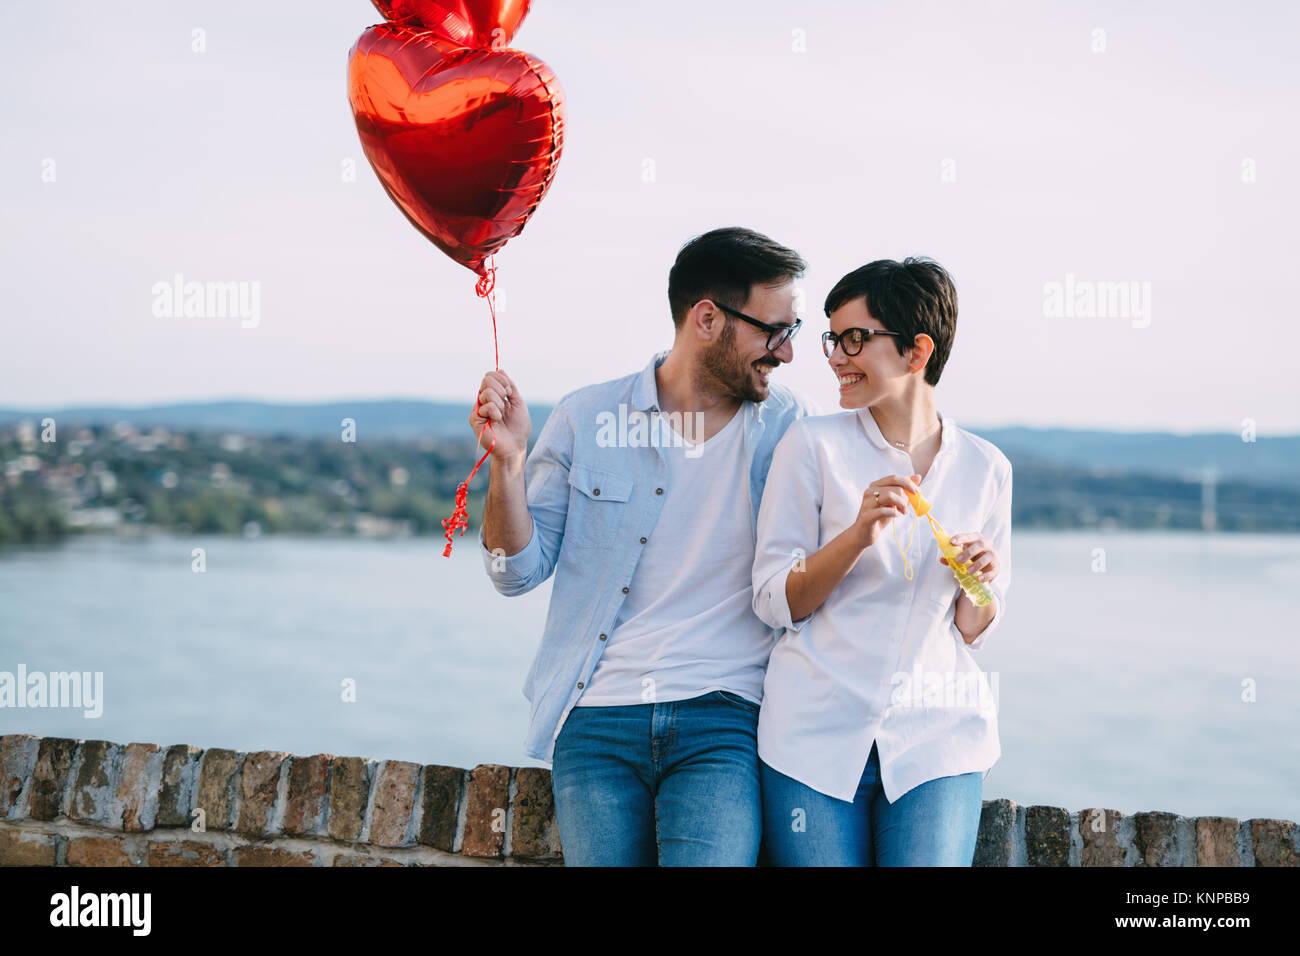 Dating best nerds for website, Dating christian god's way